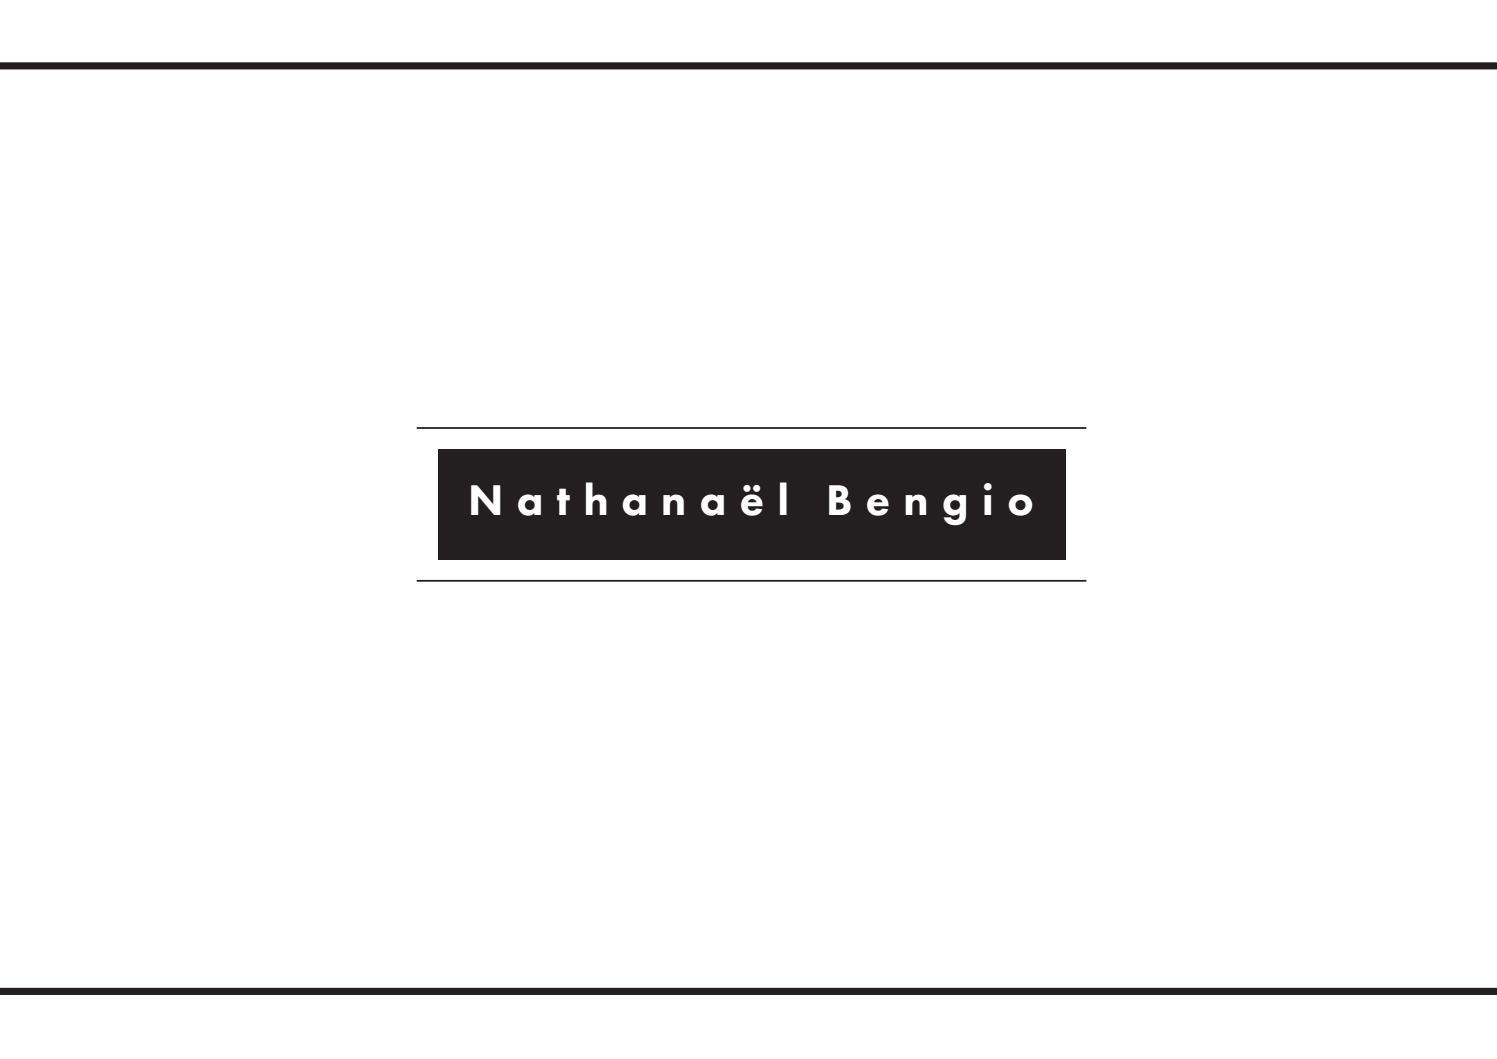 Panneau Melamine Noir Mat nathanael bengionathanael bengio - issuu